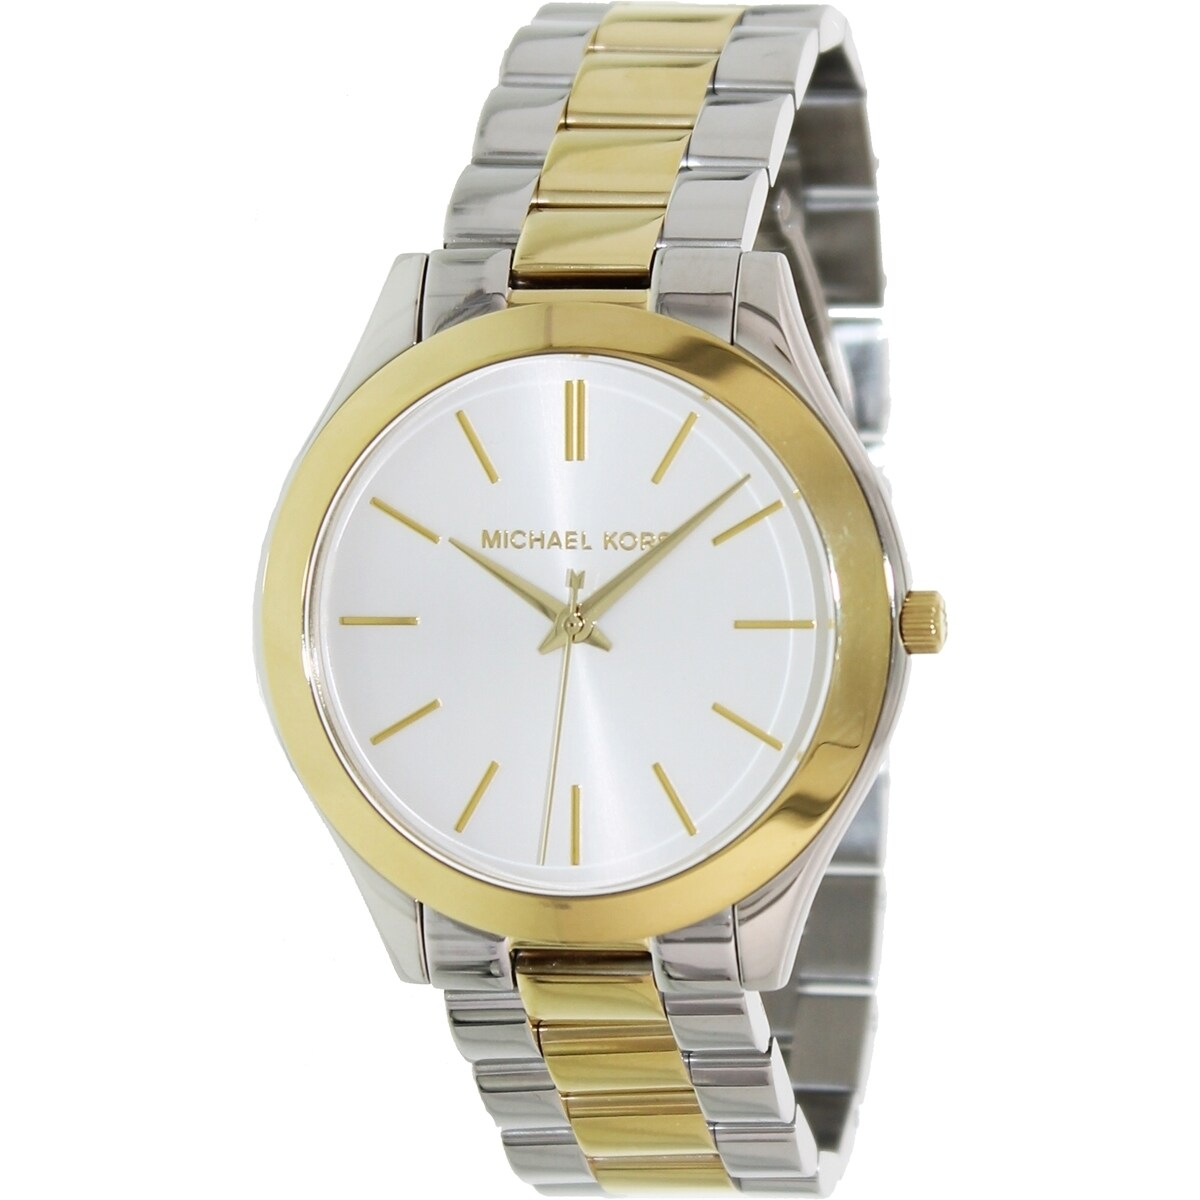 Michael Kors Women's MK3198 Slim Runway Two-tone Watch, S...